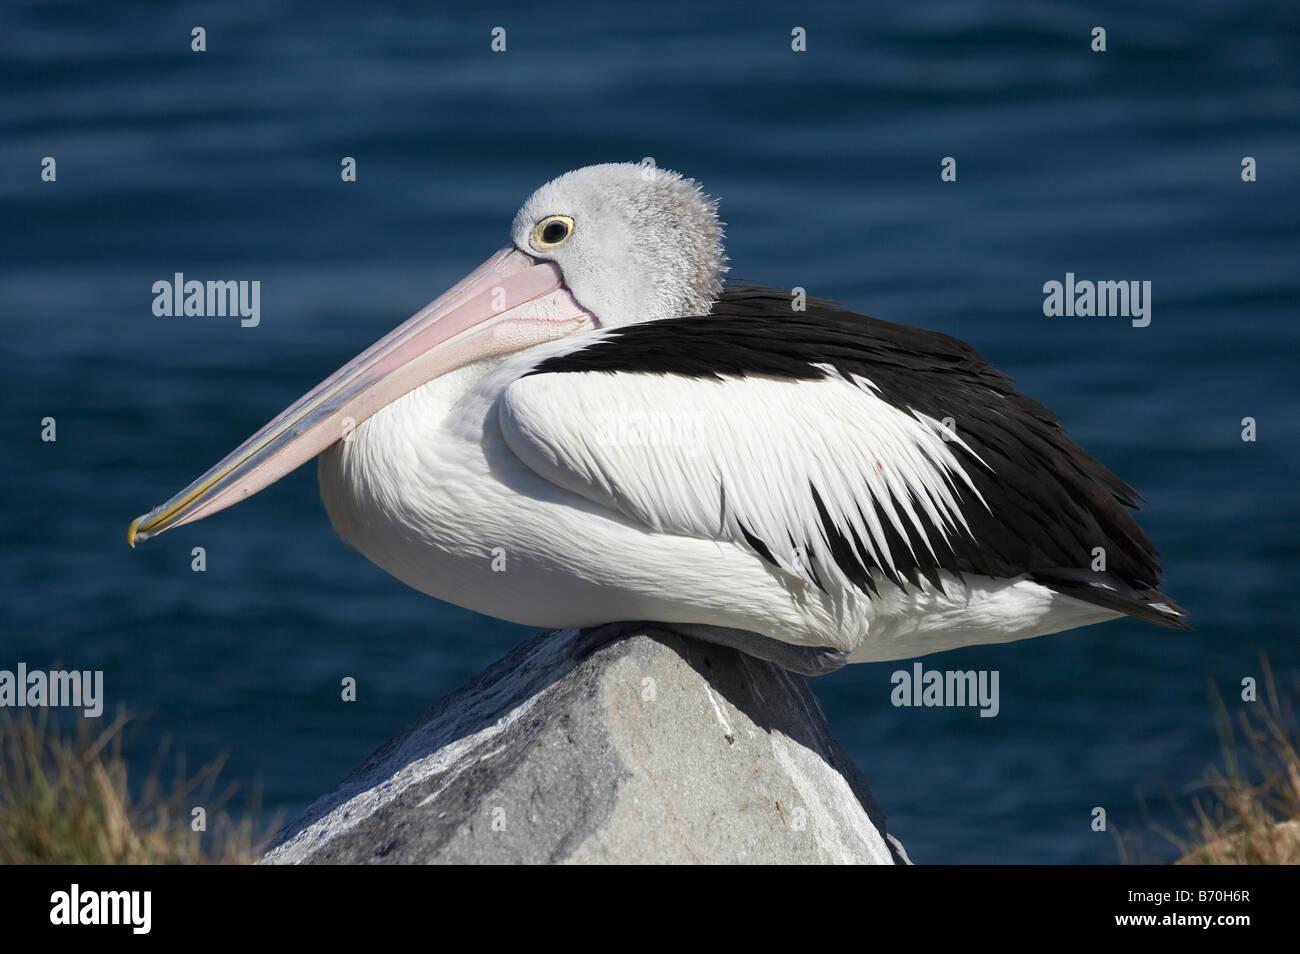 Australian Pelican Pelecanus conspicillatus Blacksmiths Swansea Channel New South Wales Australia - Stock Image